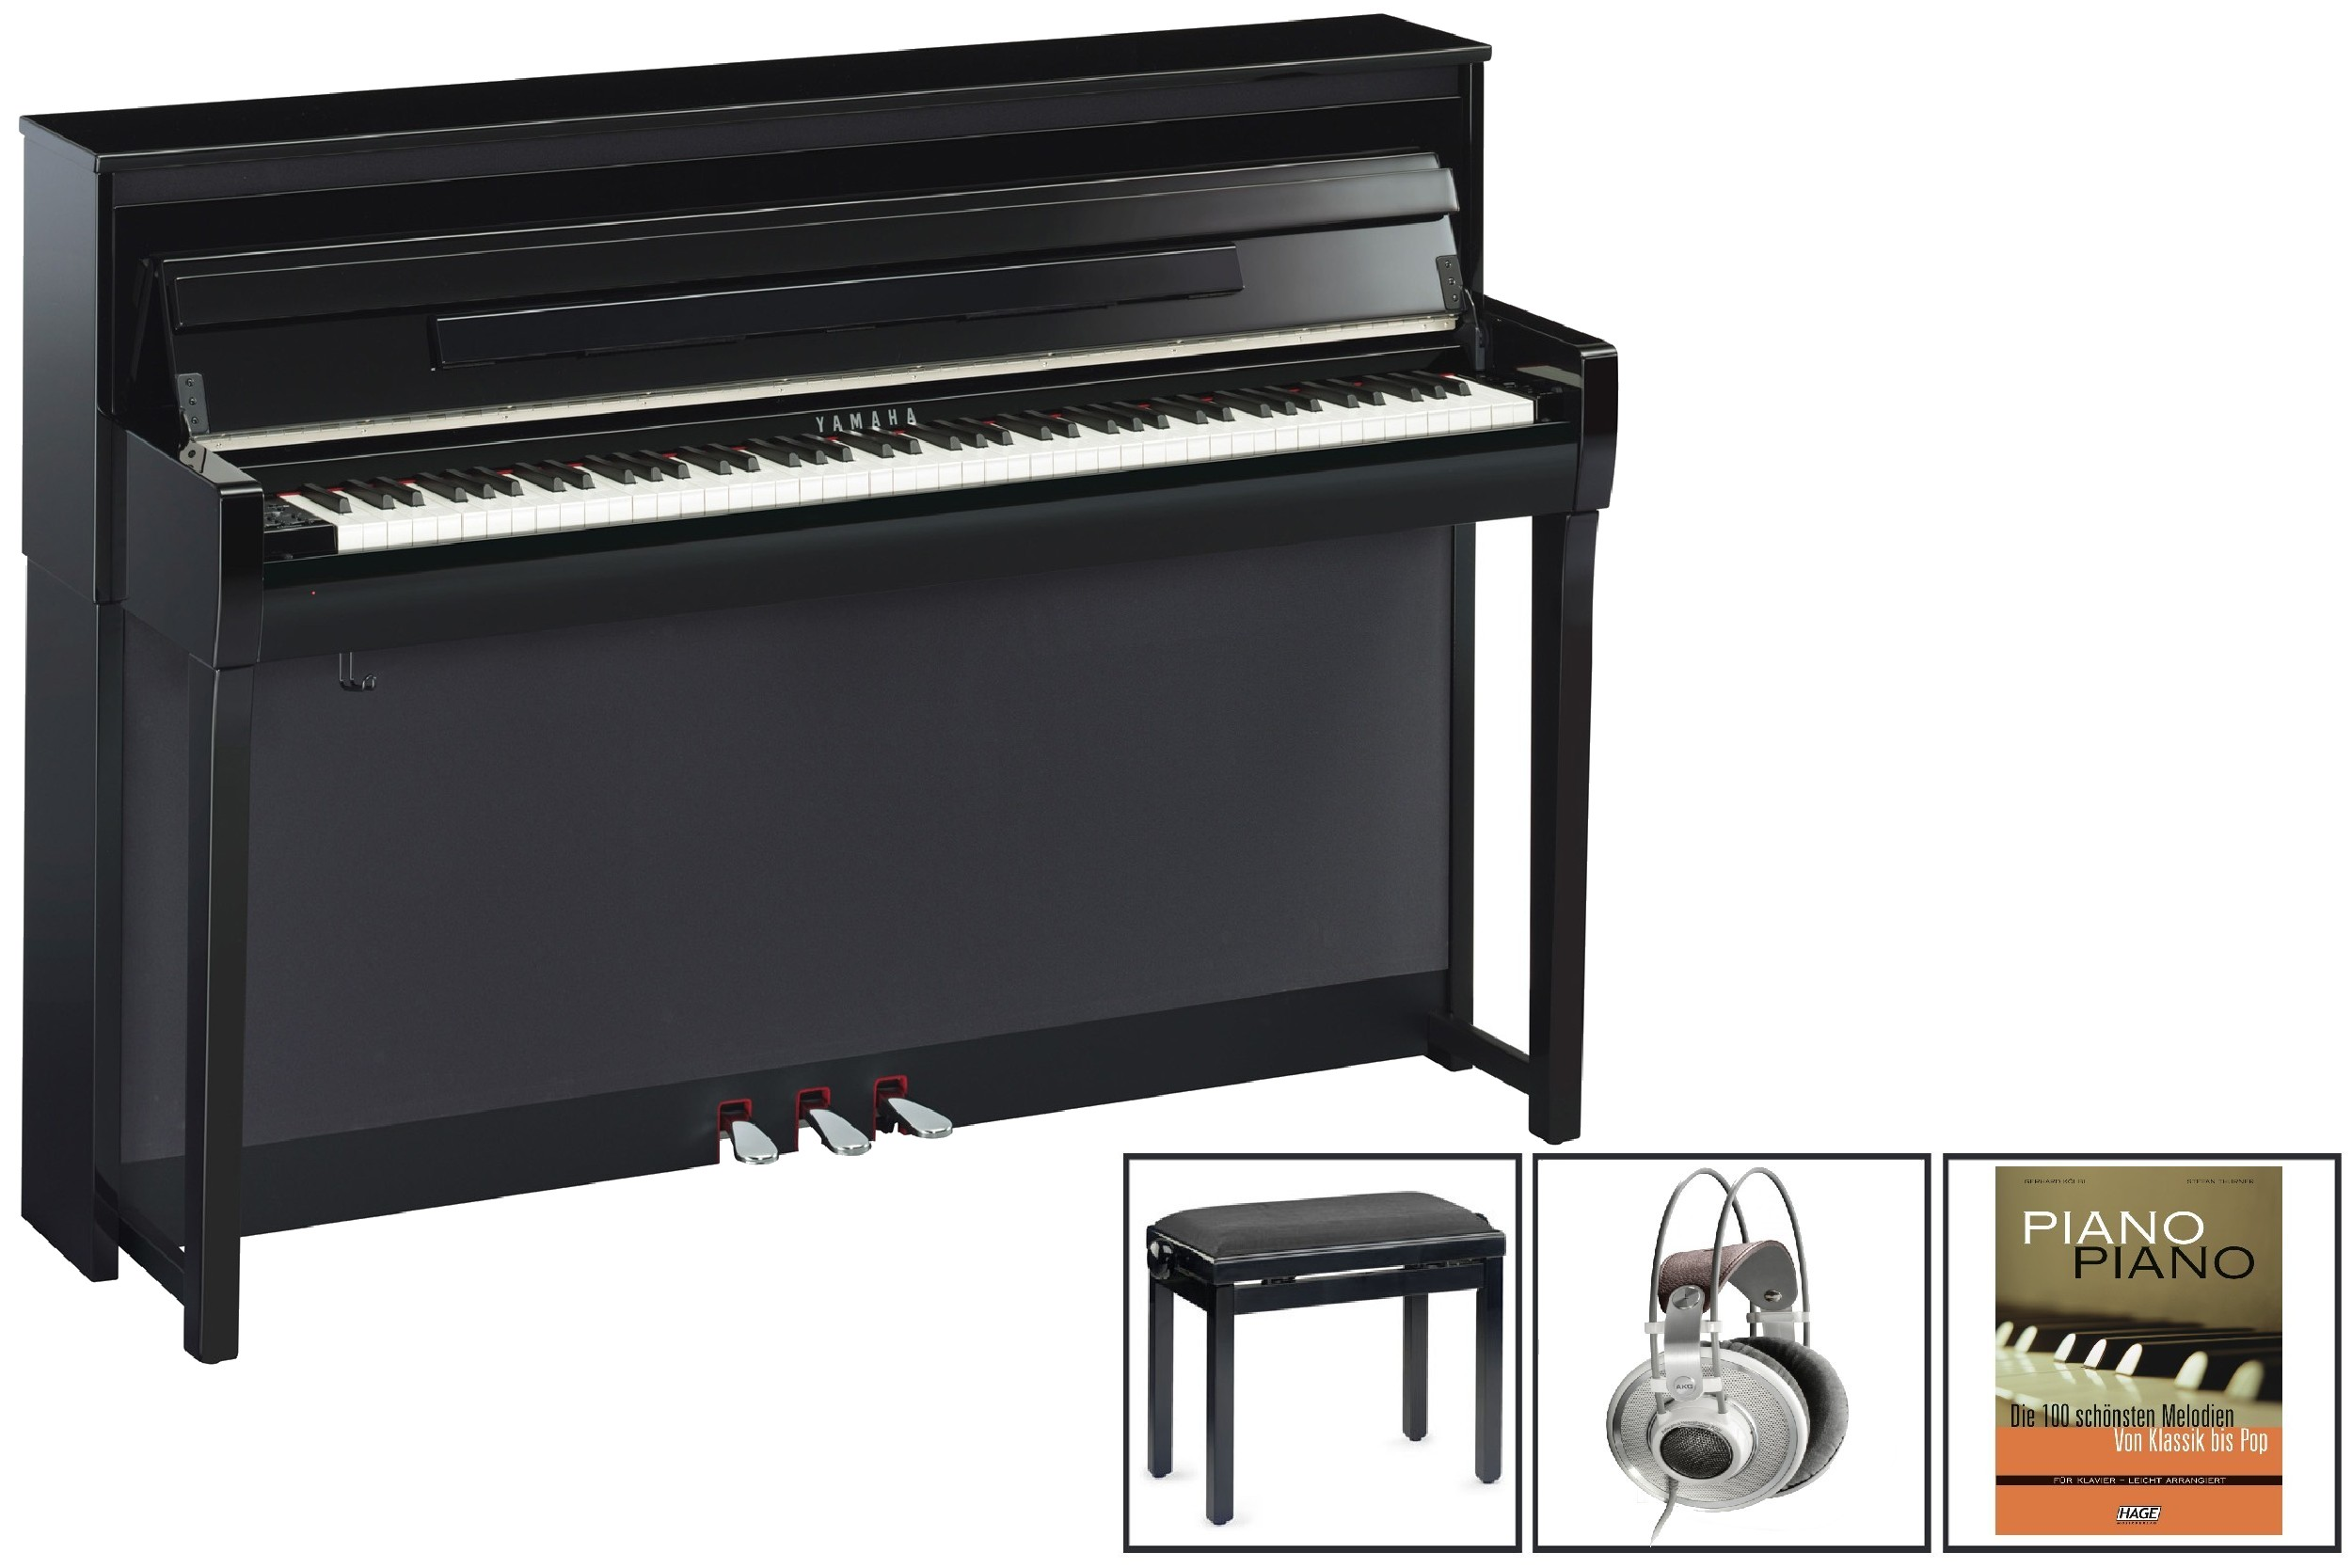 yamaha clp 685 clavinova exklusiv set 1 musikhaus. Black Bedroom Furniture Sets. Home Design Ideas